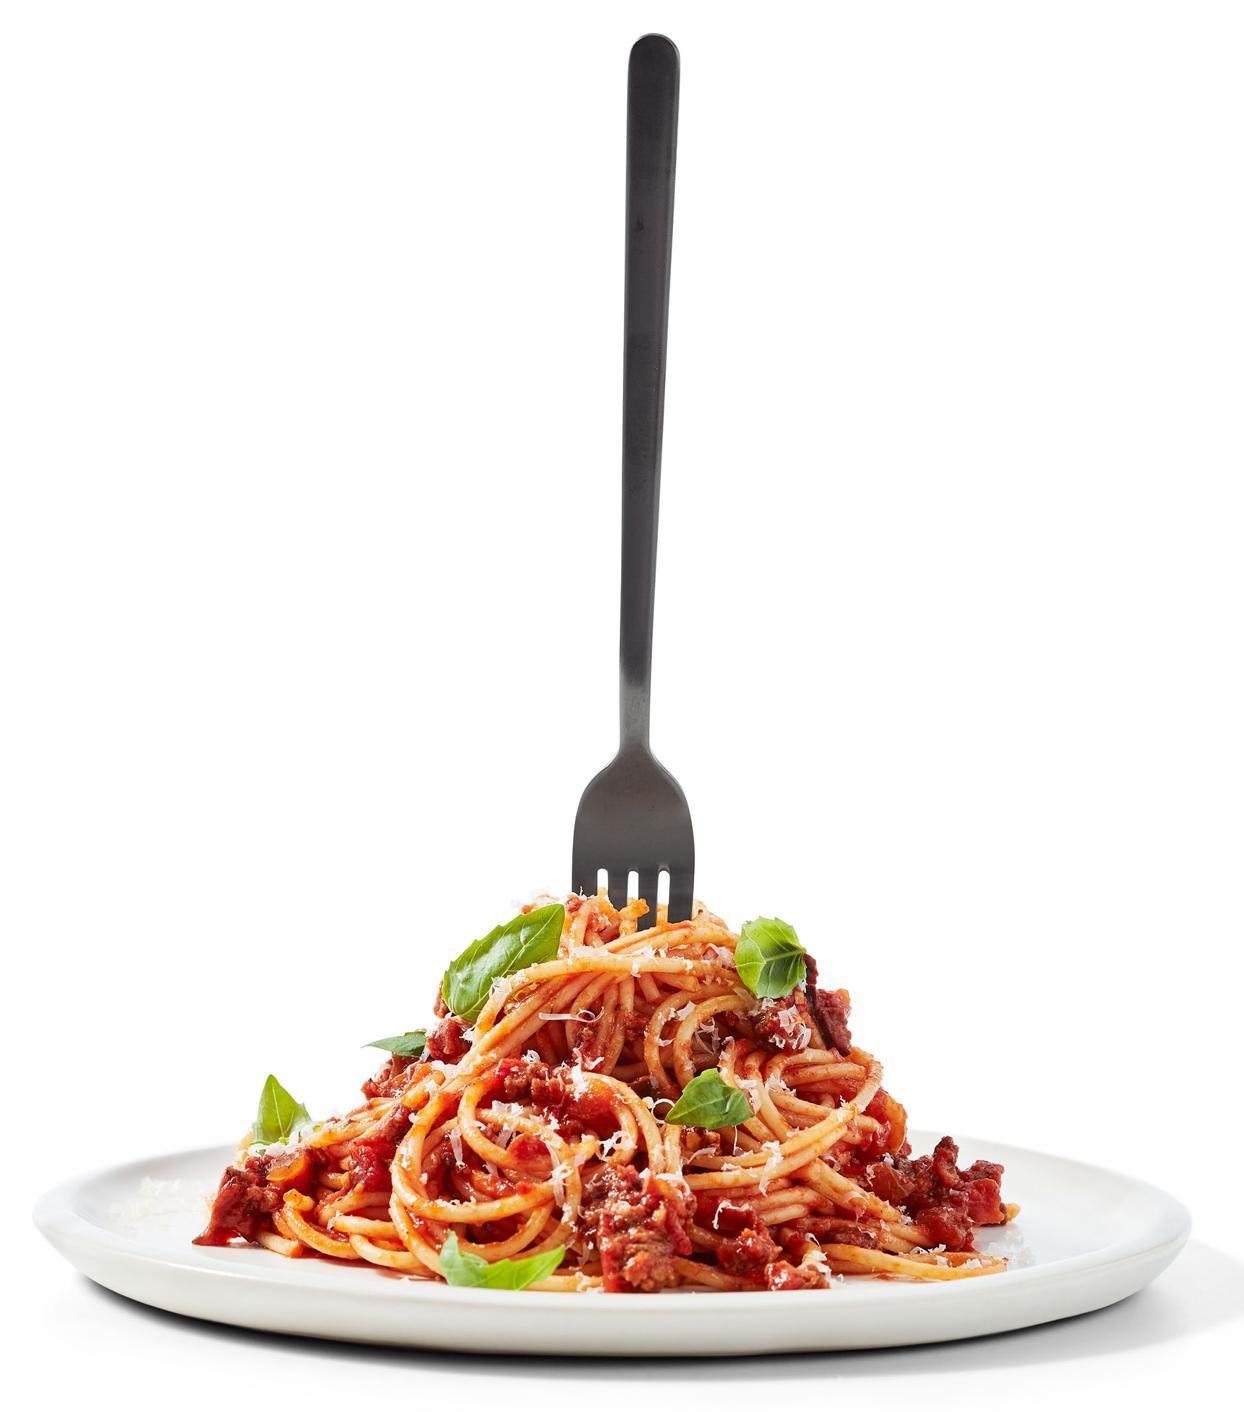 spaghetti with lamb and olive ragu